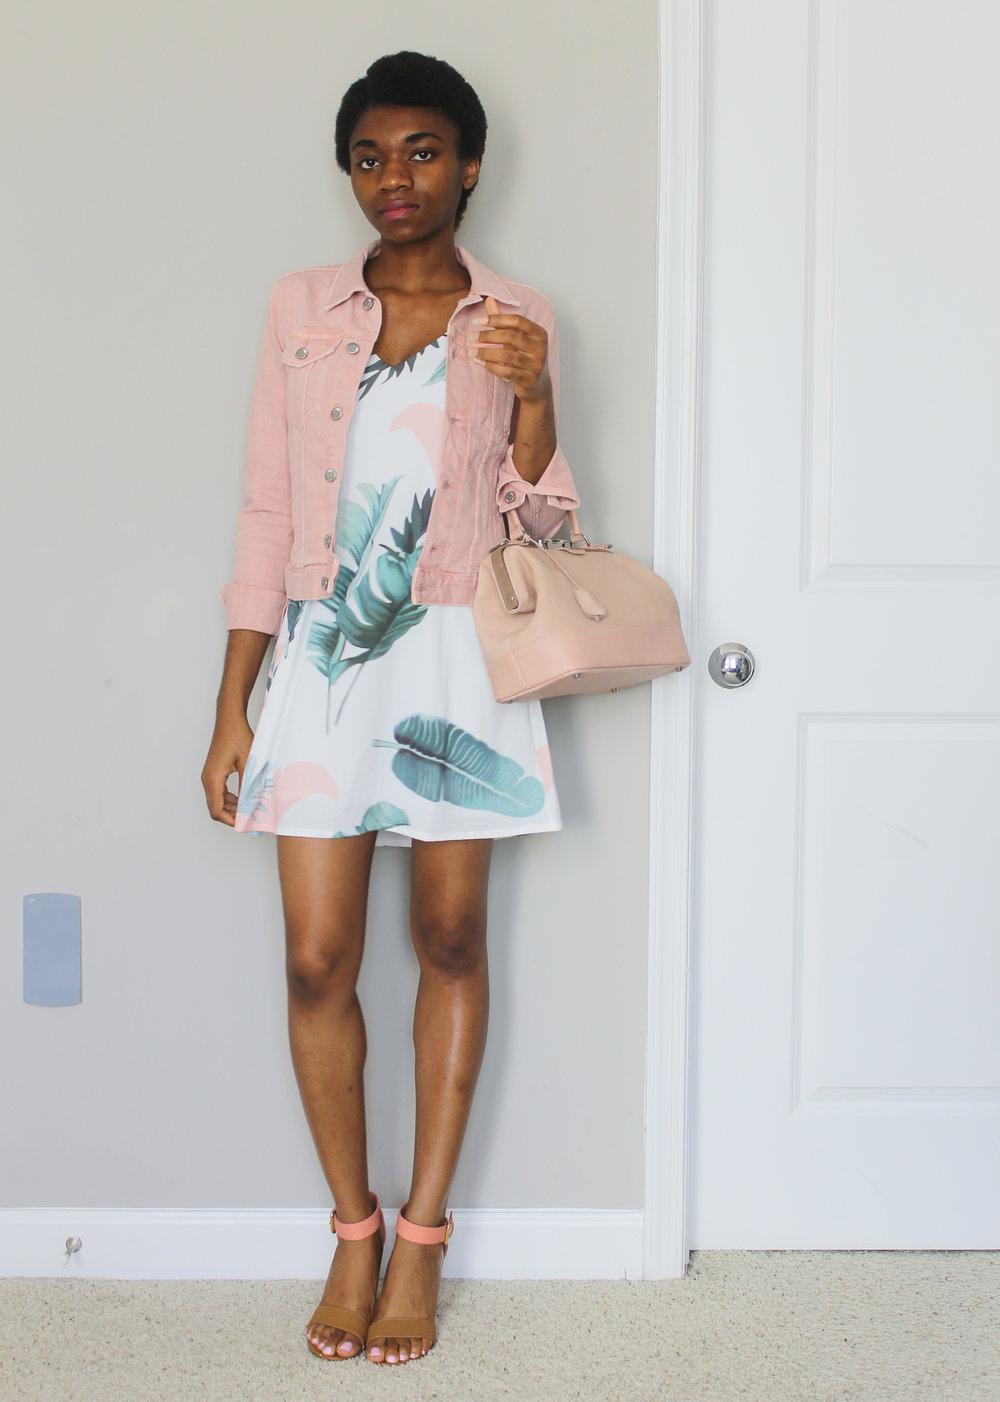 4WaystoWear-tropical-prints-dress 13.jpg